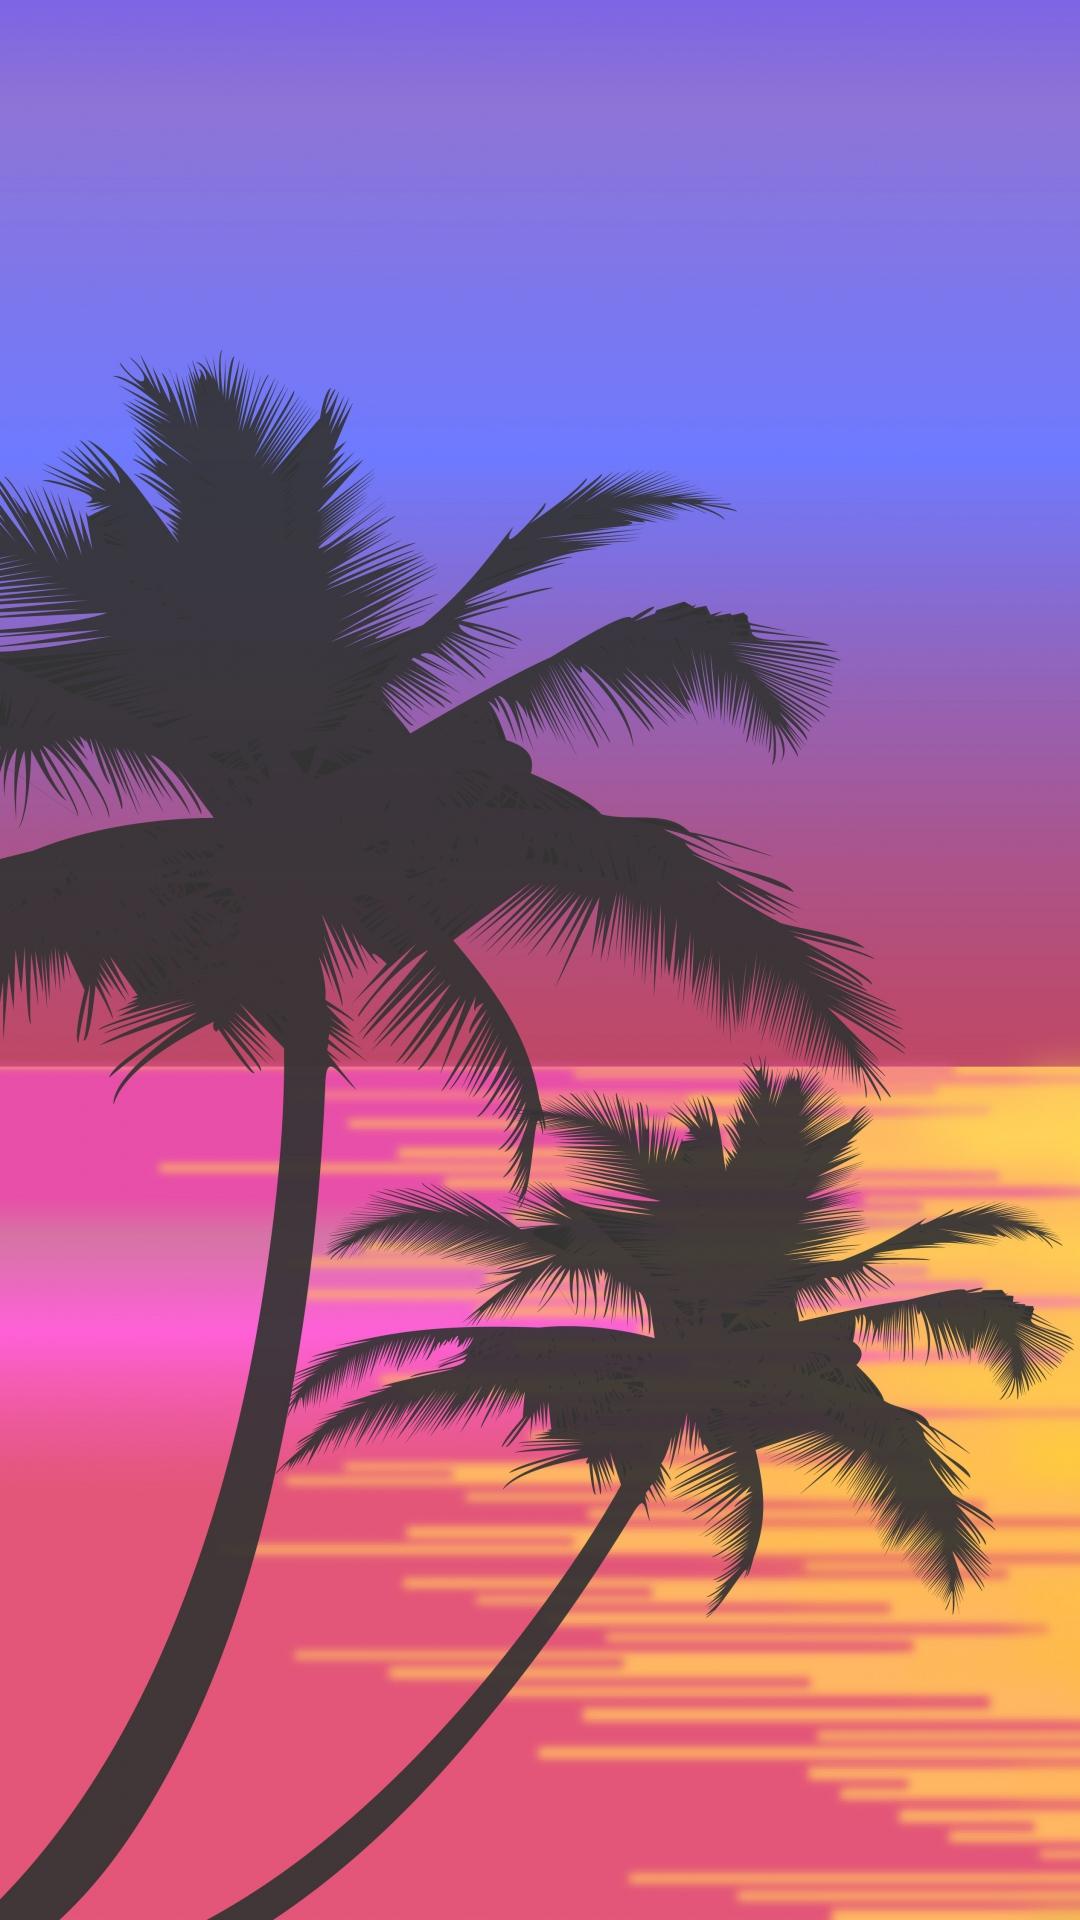 Palm Tree Iphone Wallpaper - Palm Tree Wallpaper Iphone - HD Wallpaper